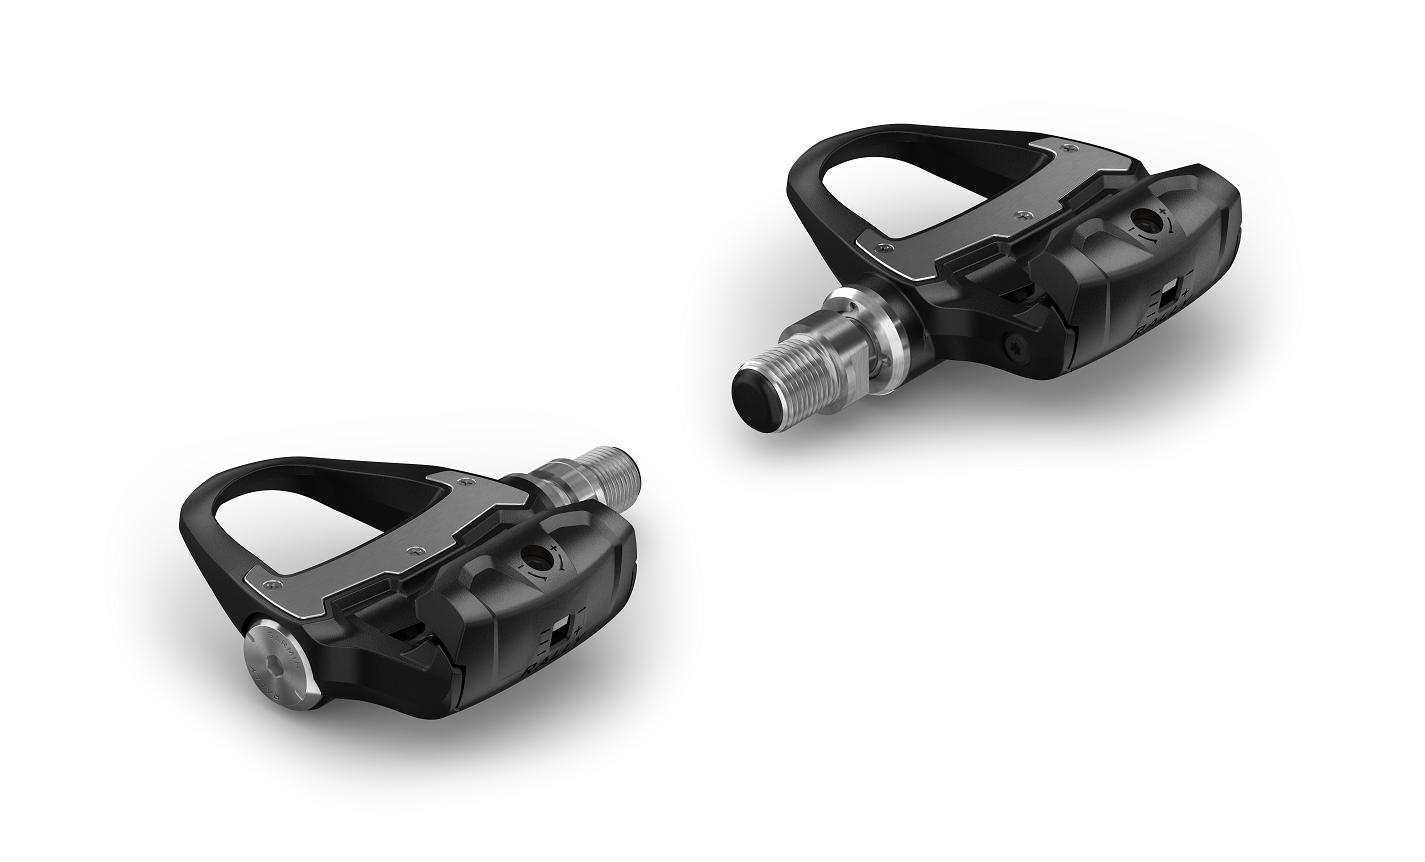 Garmin Rally™ RS200 - Leistungsmesser mit Dualsensor